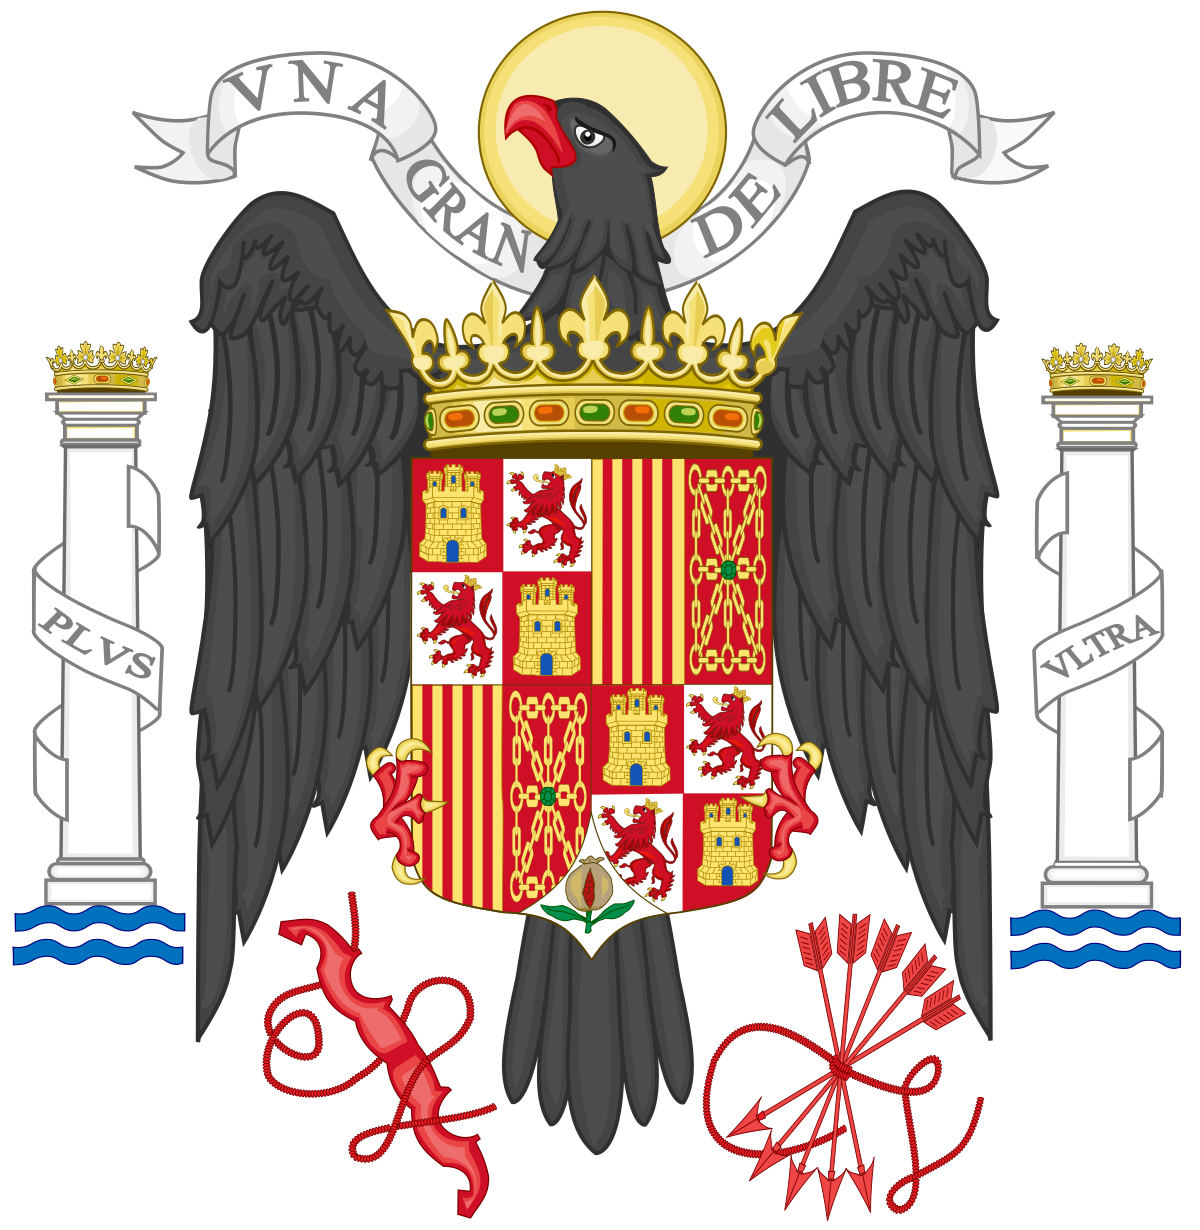 Vision clipart ww 2. Spain during world war